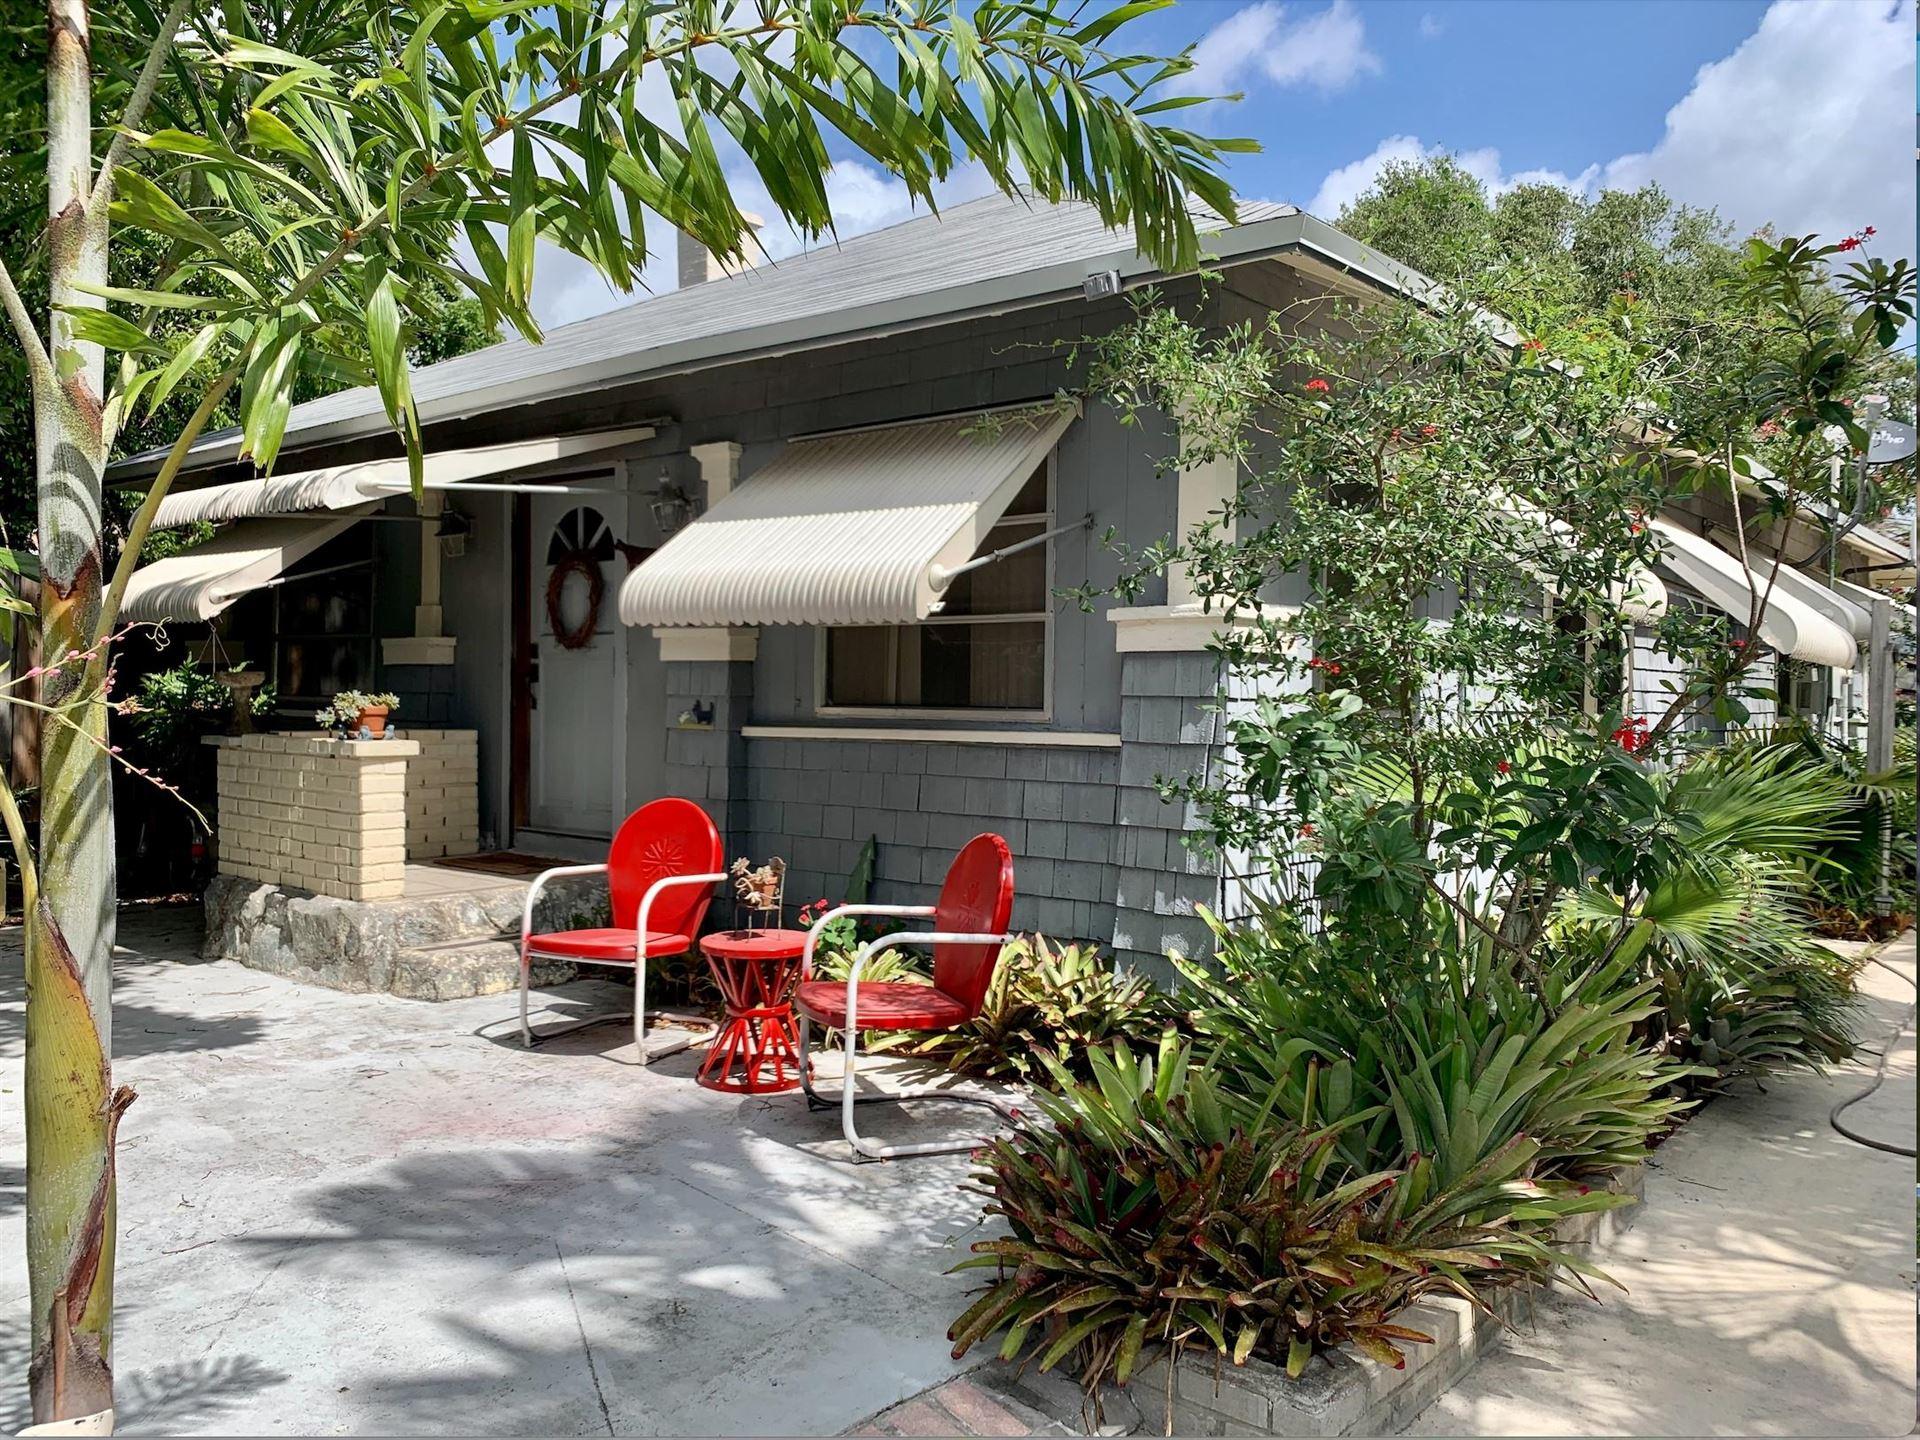 427 Sunset Road, West Palm Beach, FL 33401 - MLS#: RX-10715334